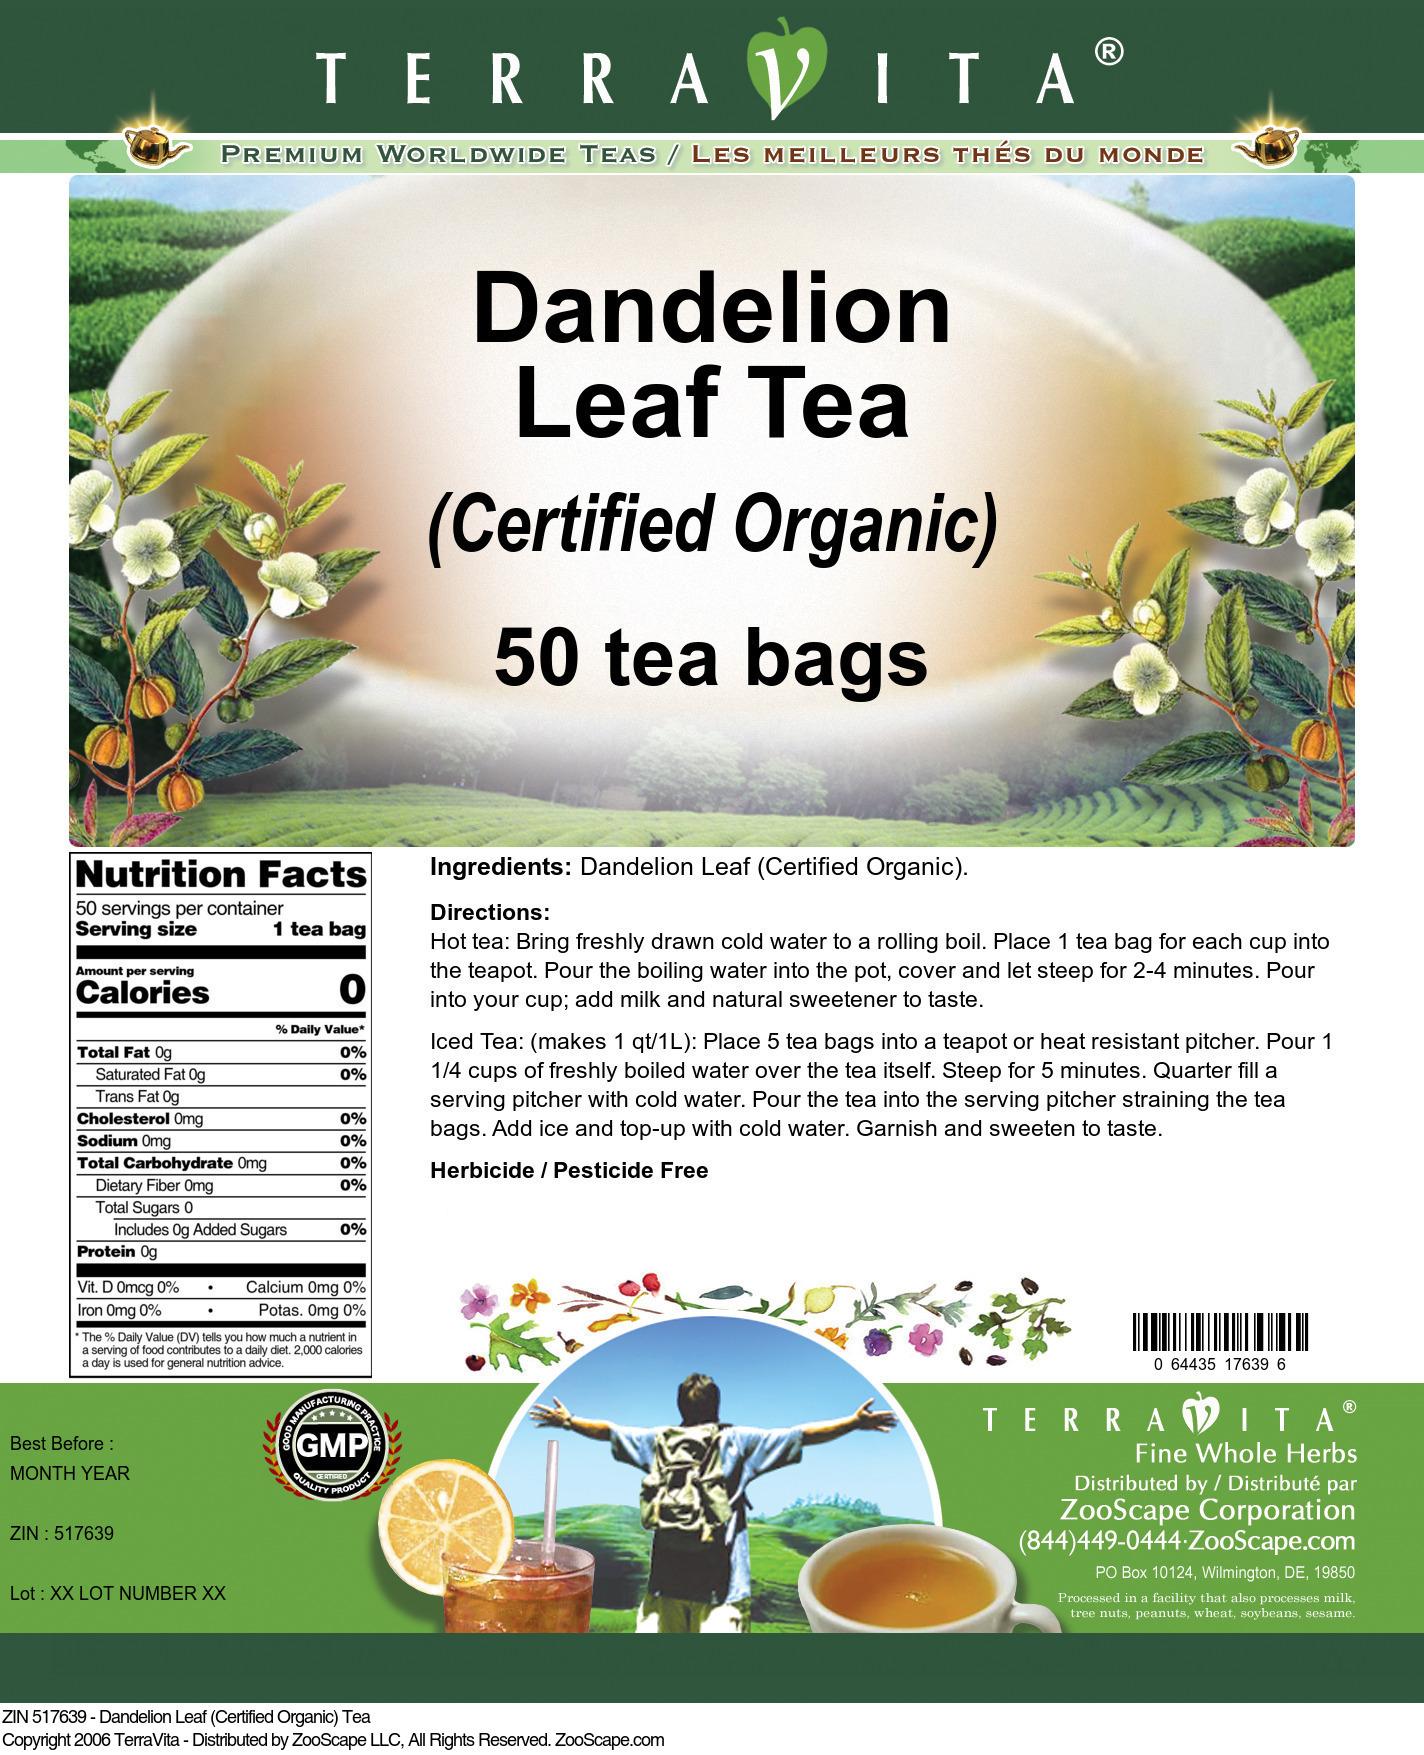 Dandelion Leaf (Certified Organic) Tea